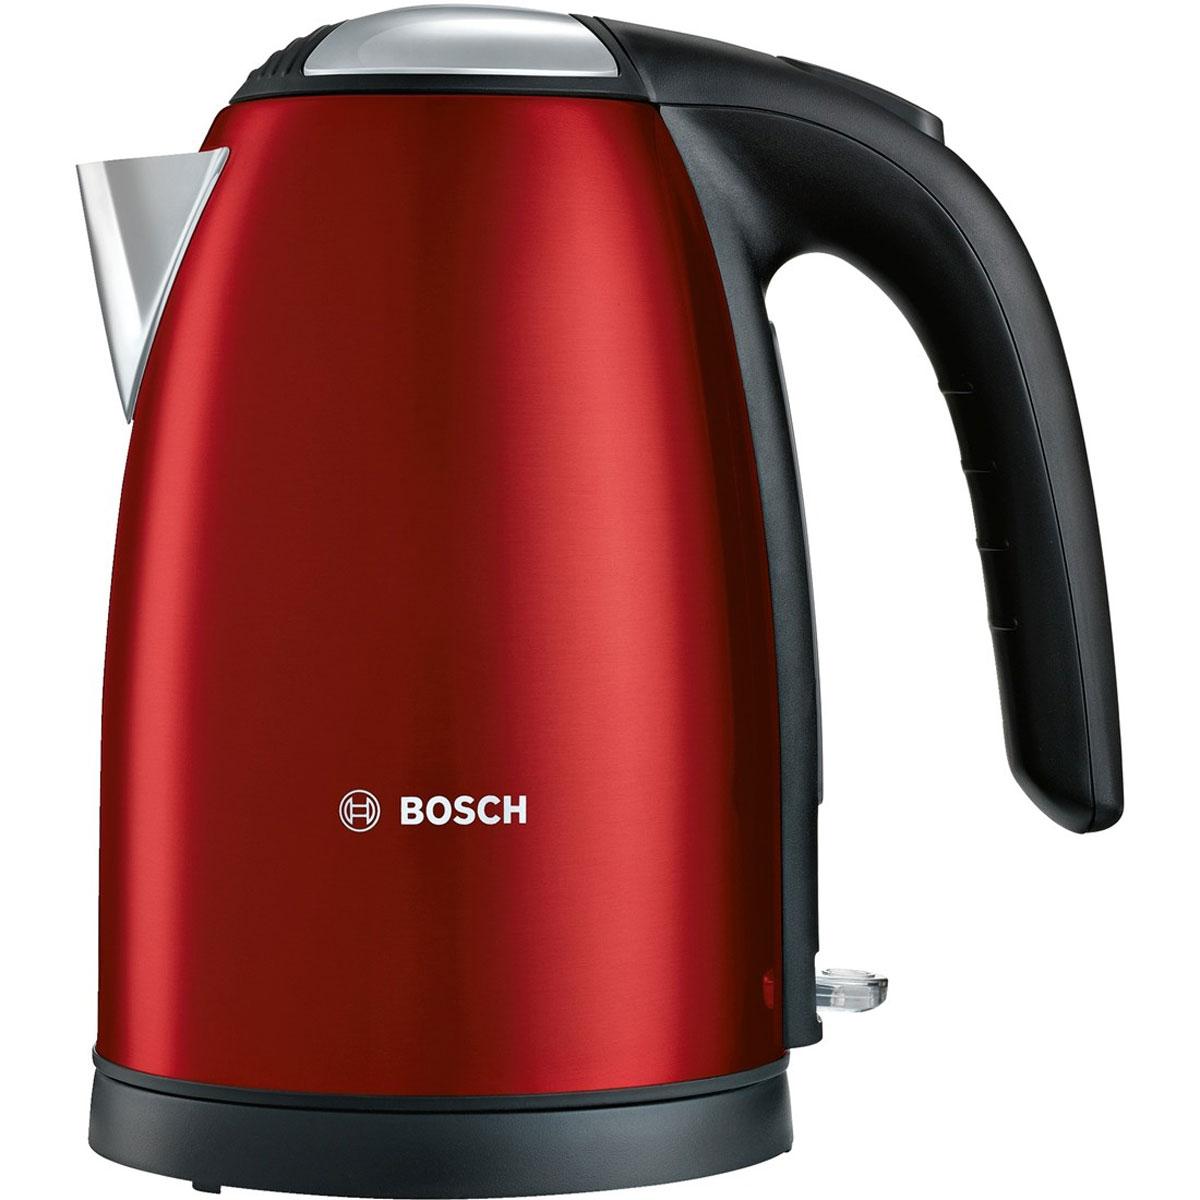 Bosch TWK 7804, Red чайник электрический чайник bosch twk7901 twk7901